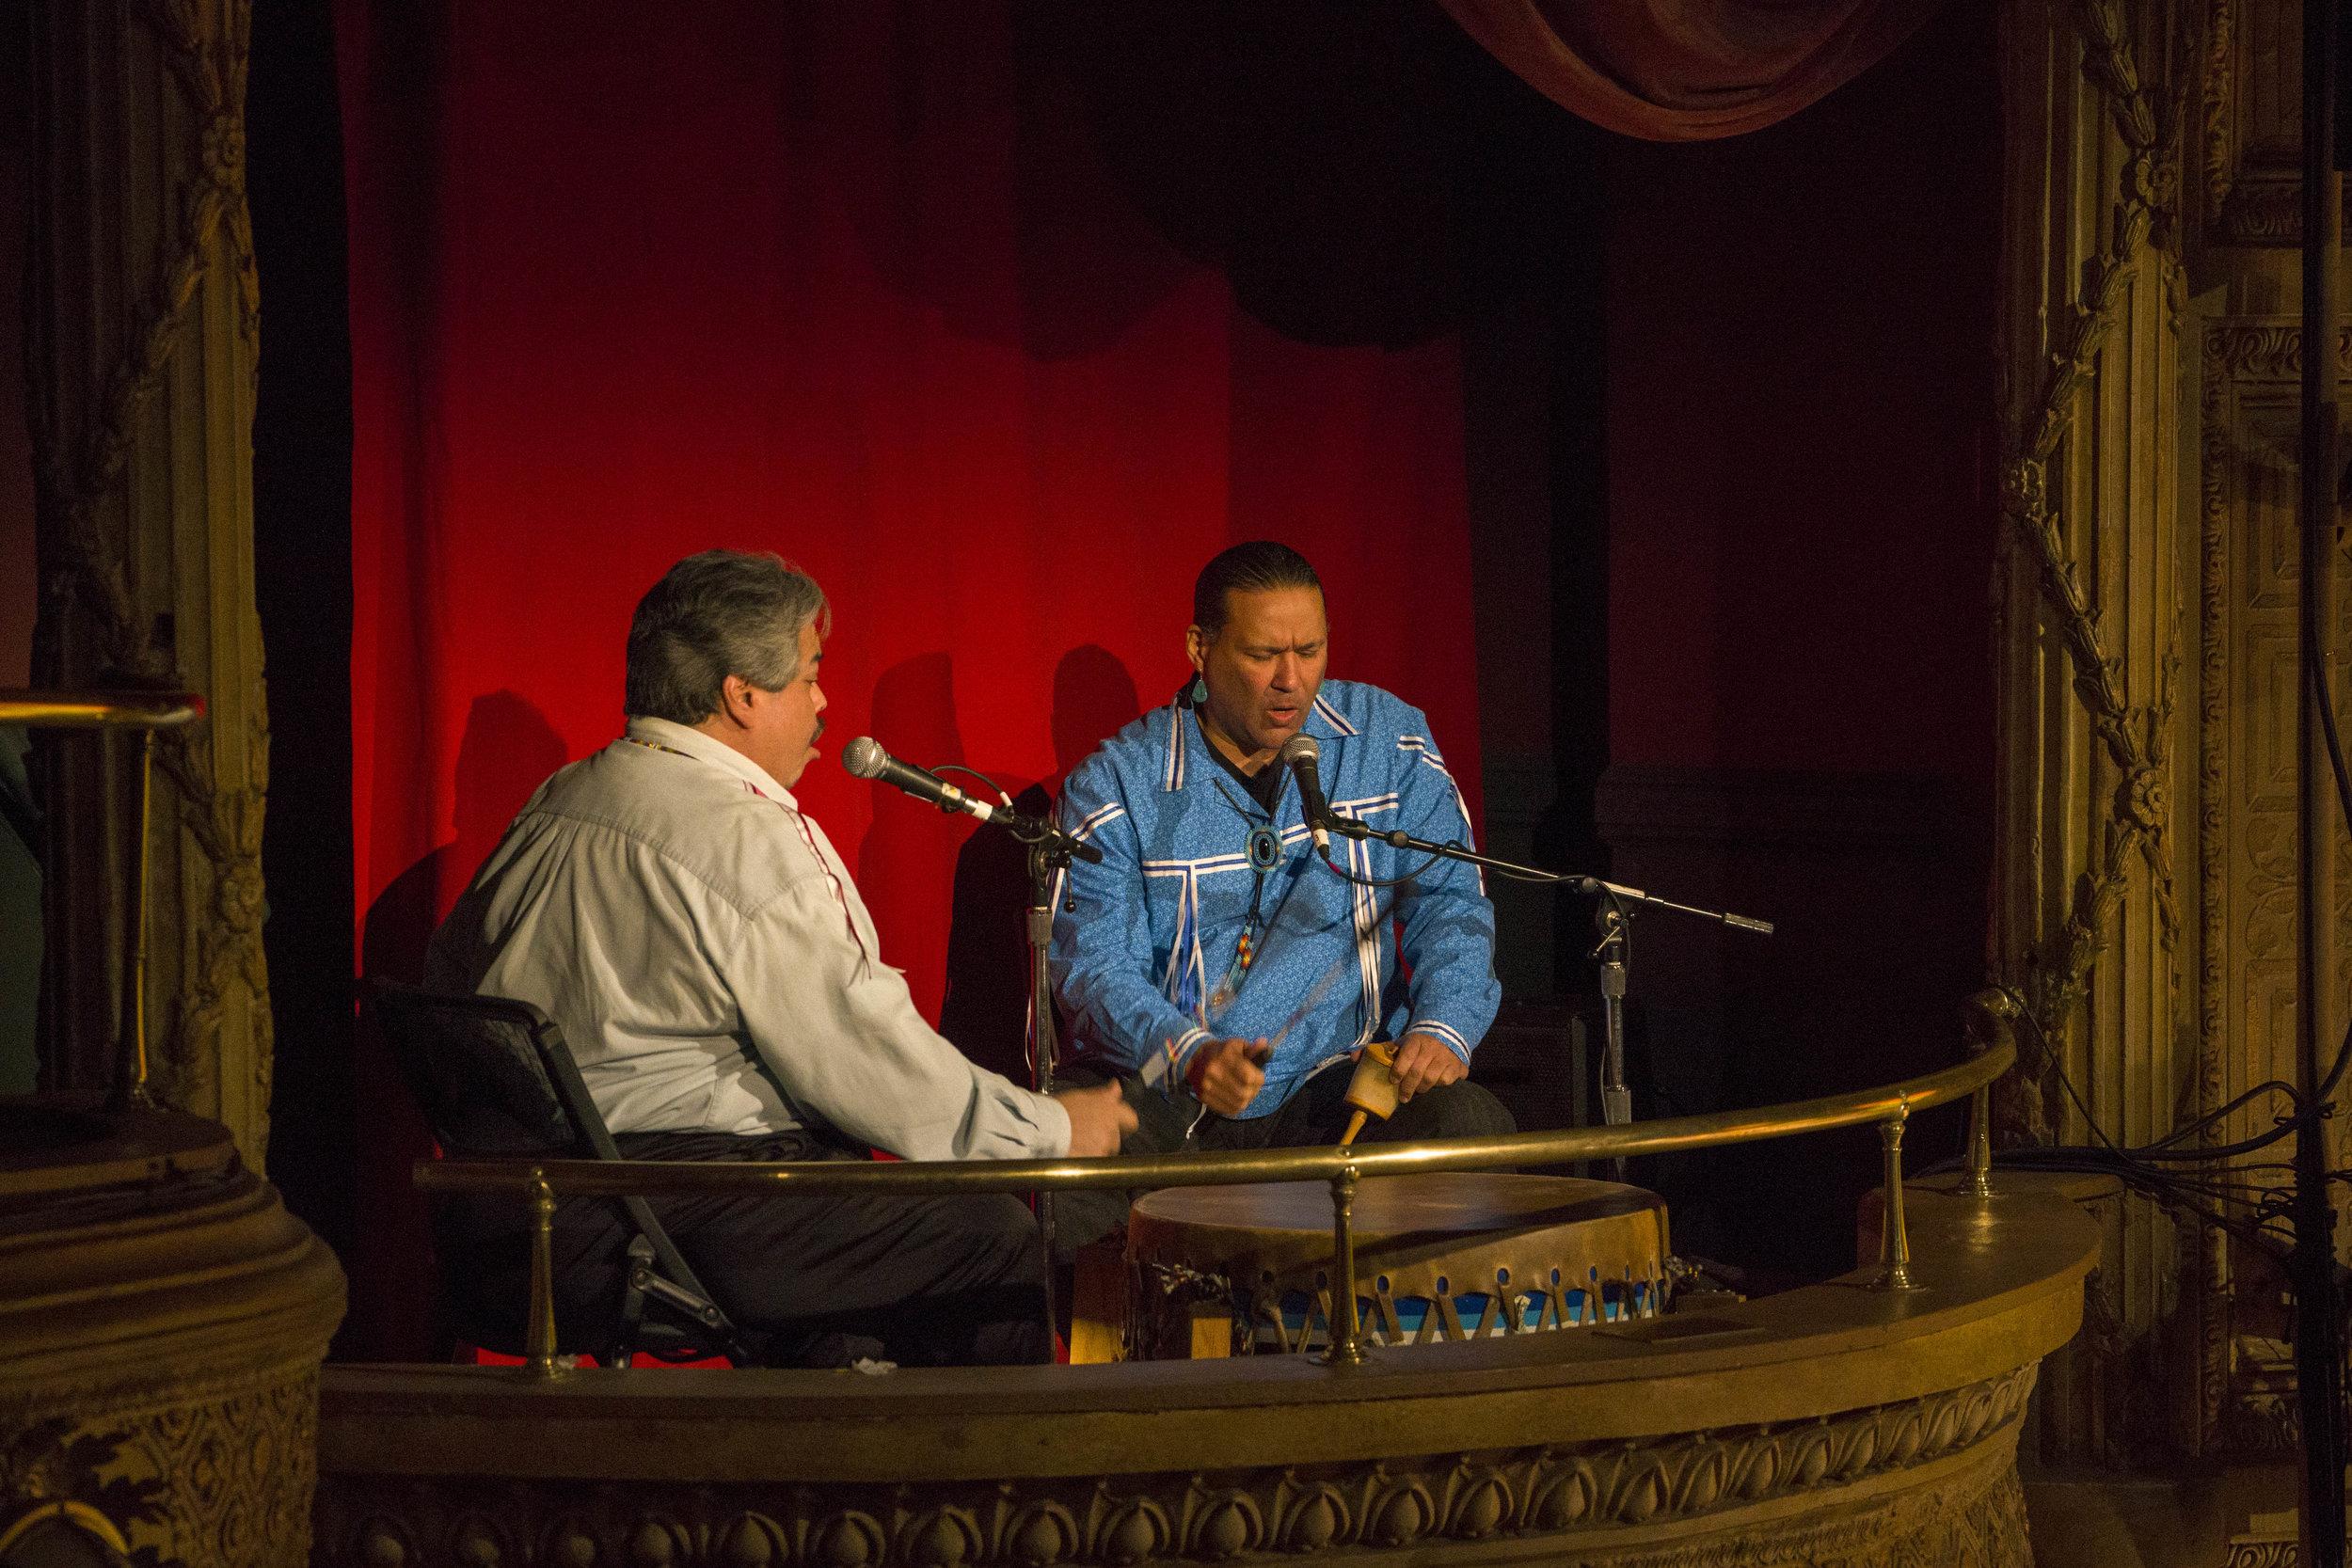 Kevin Tarrant and John Scott-Richardson